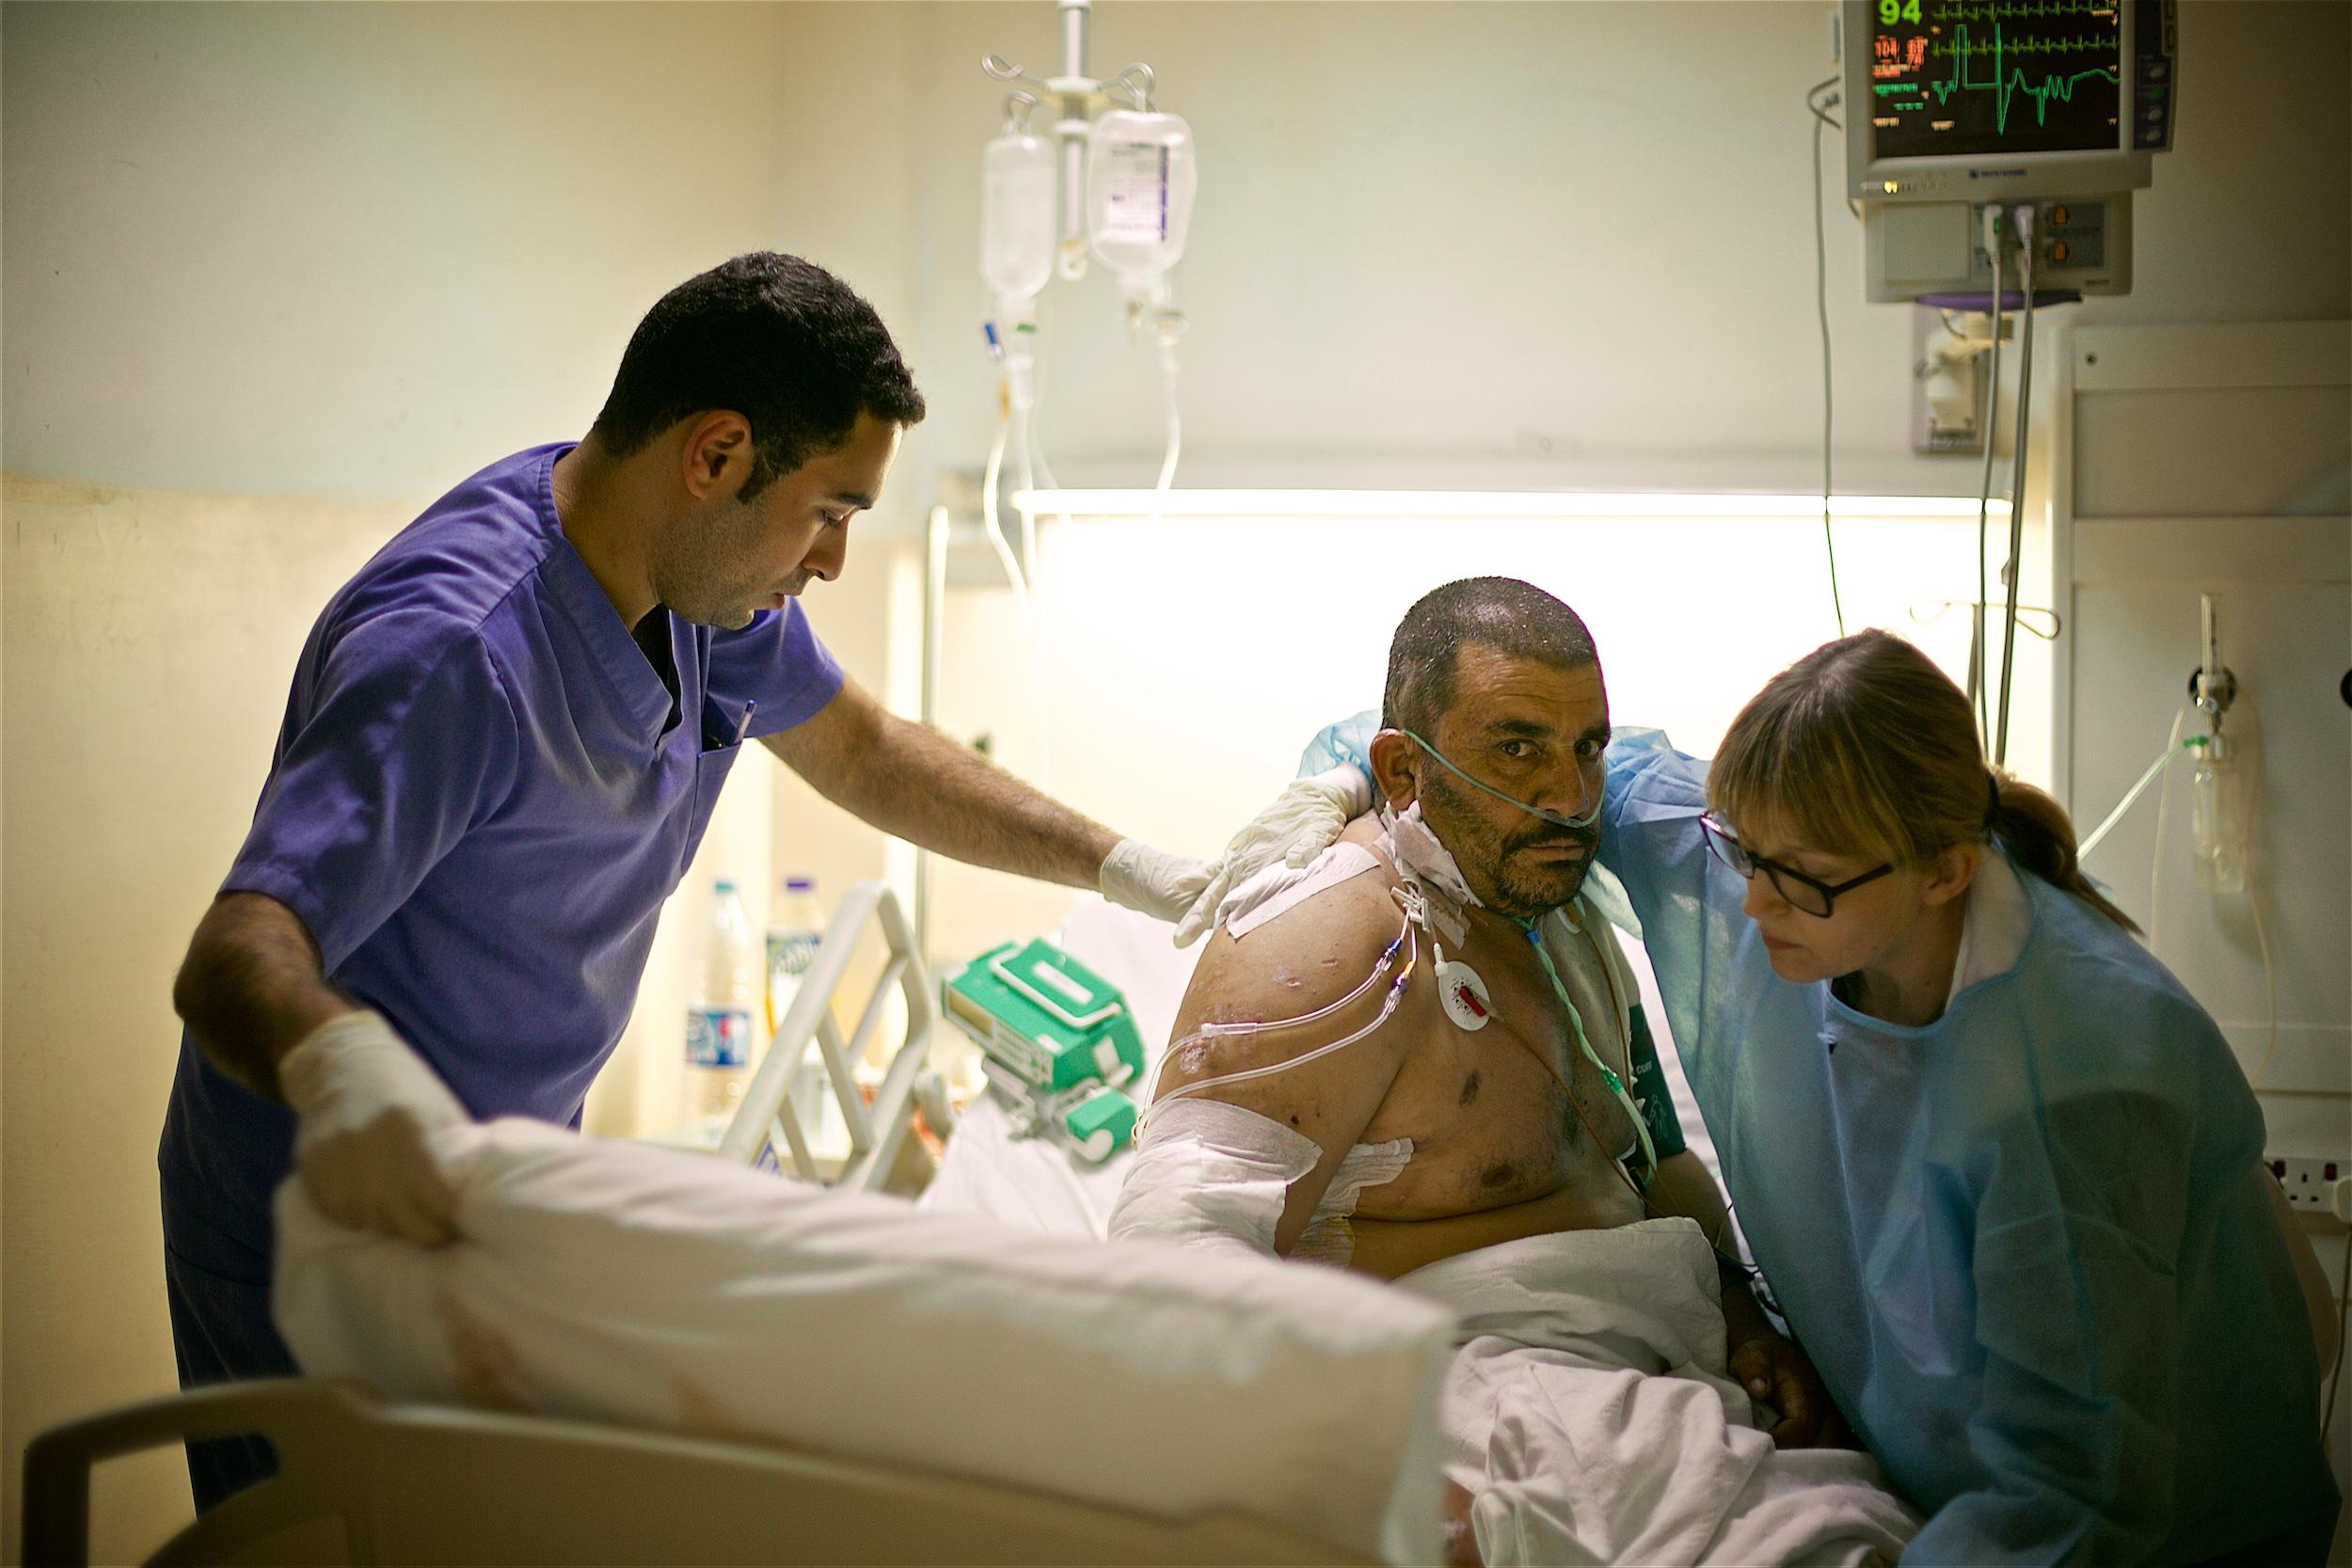 jordan-msf-al-ramtha-dectors-without-borders-war-hospital-refugee-camp-denis-bosnic-13.jpg